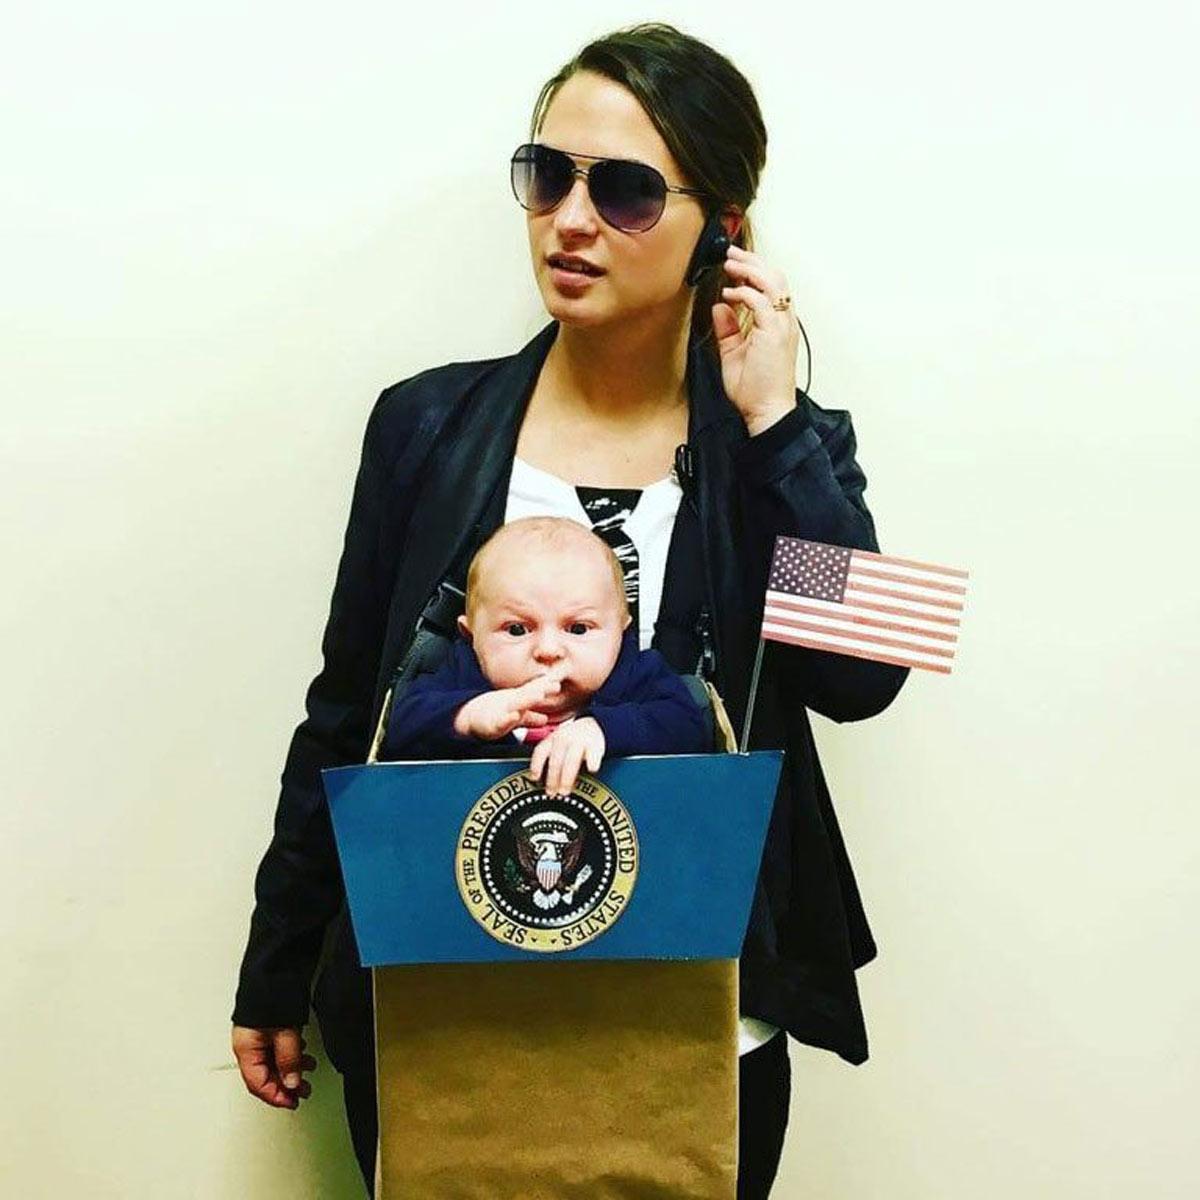 halloween-costume-ideas-president